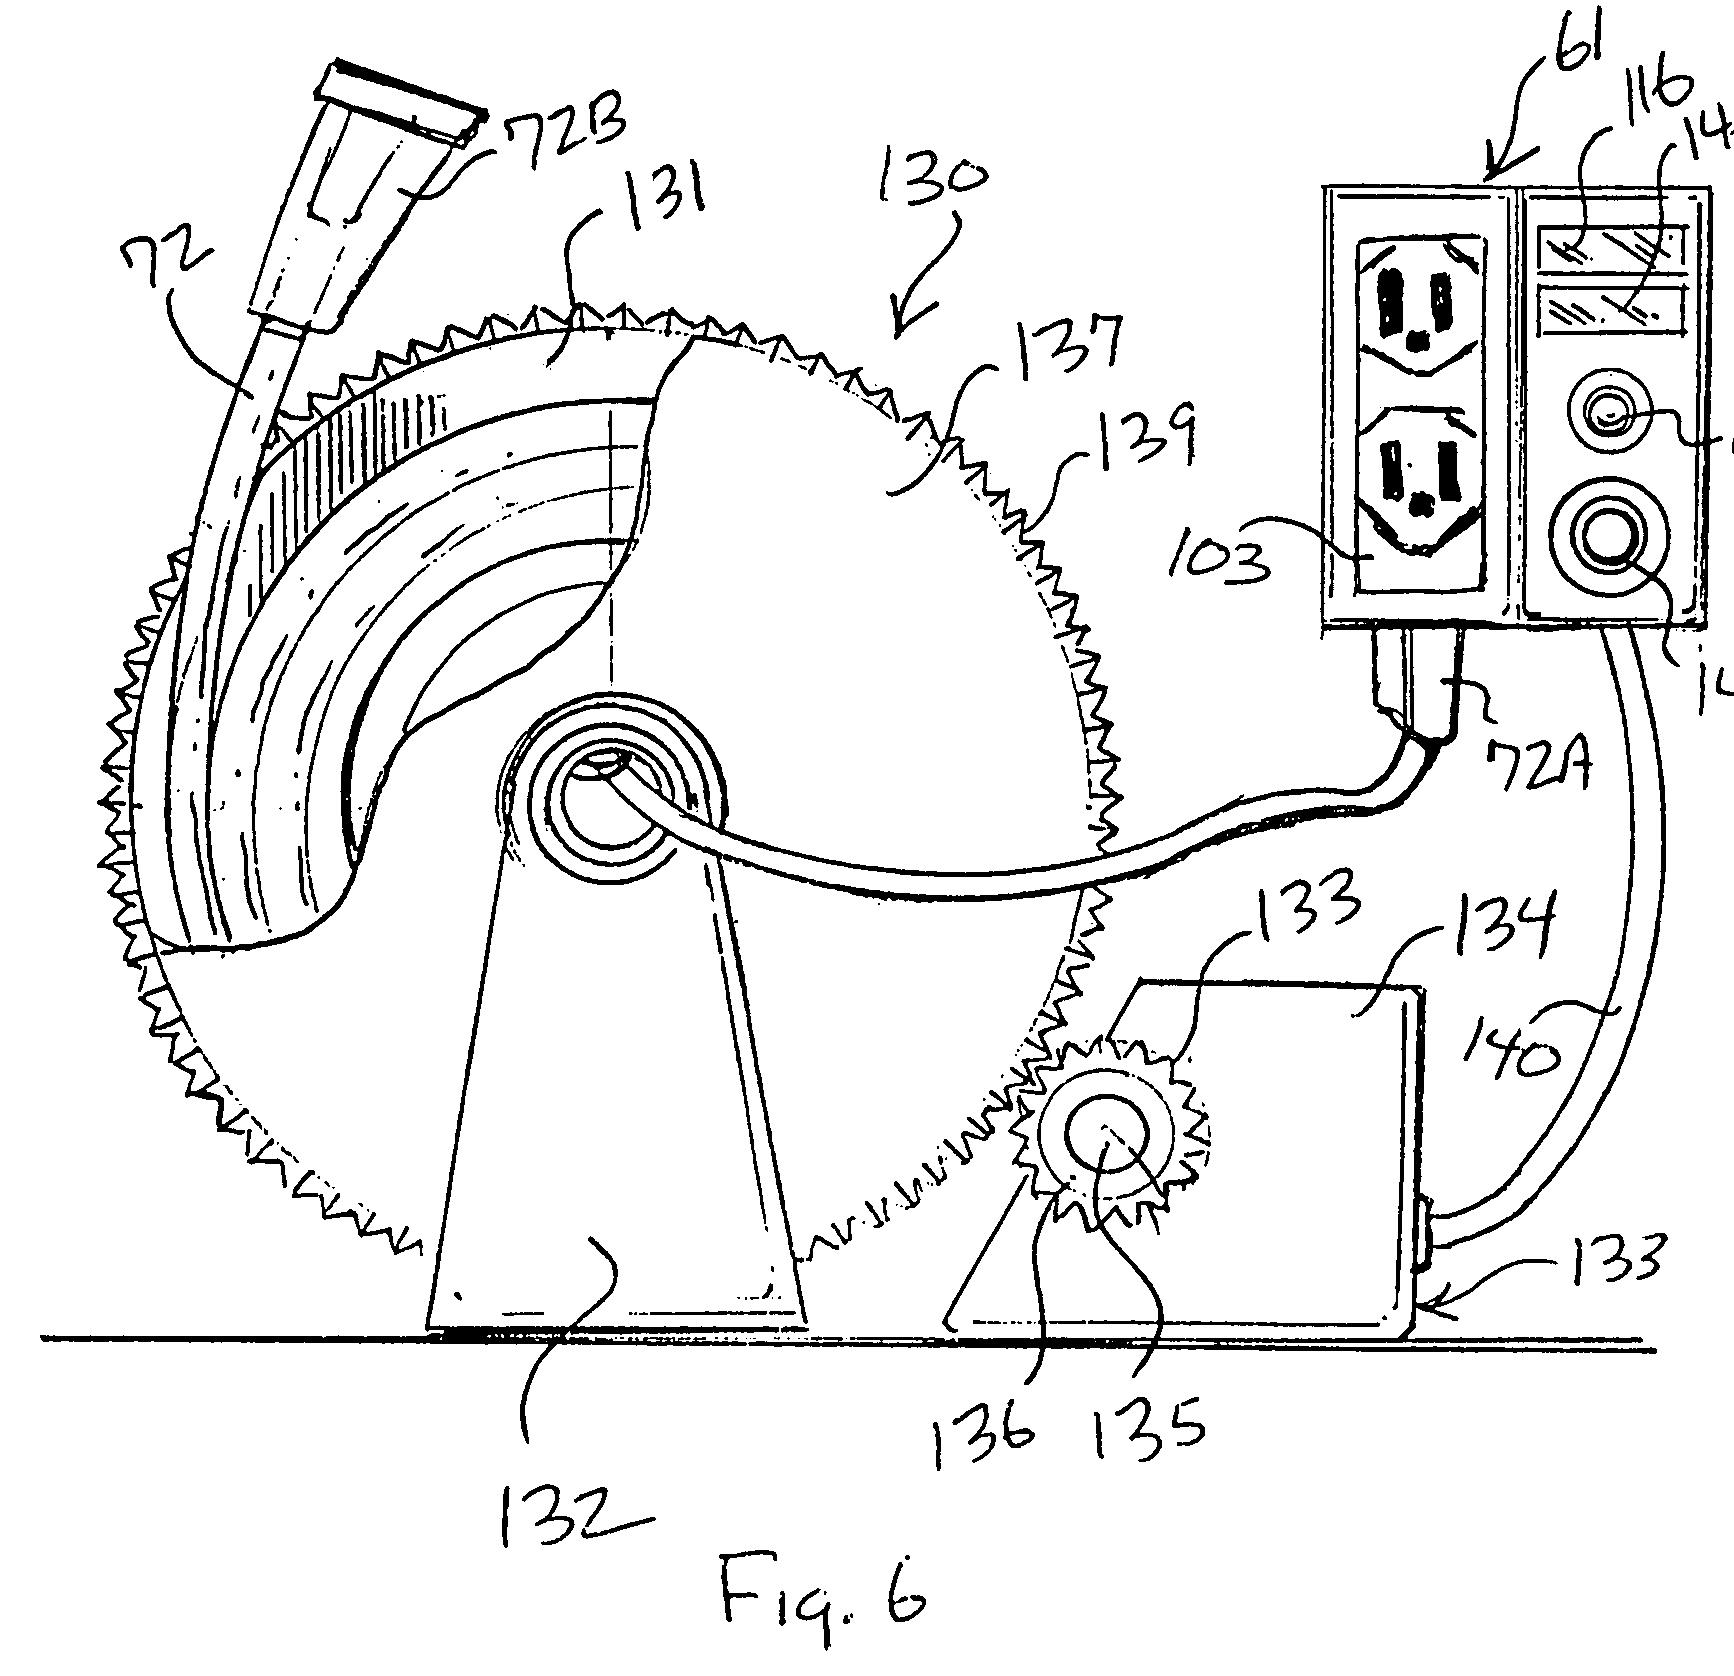 Extension Cord Plug Wiring Diagram